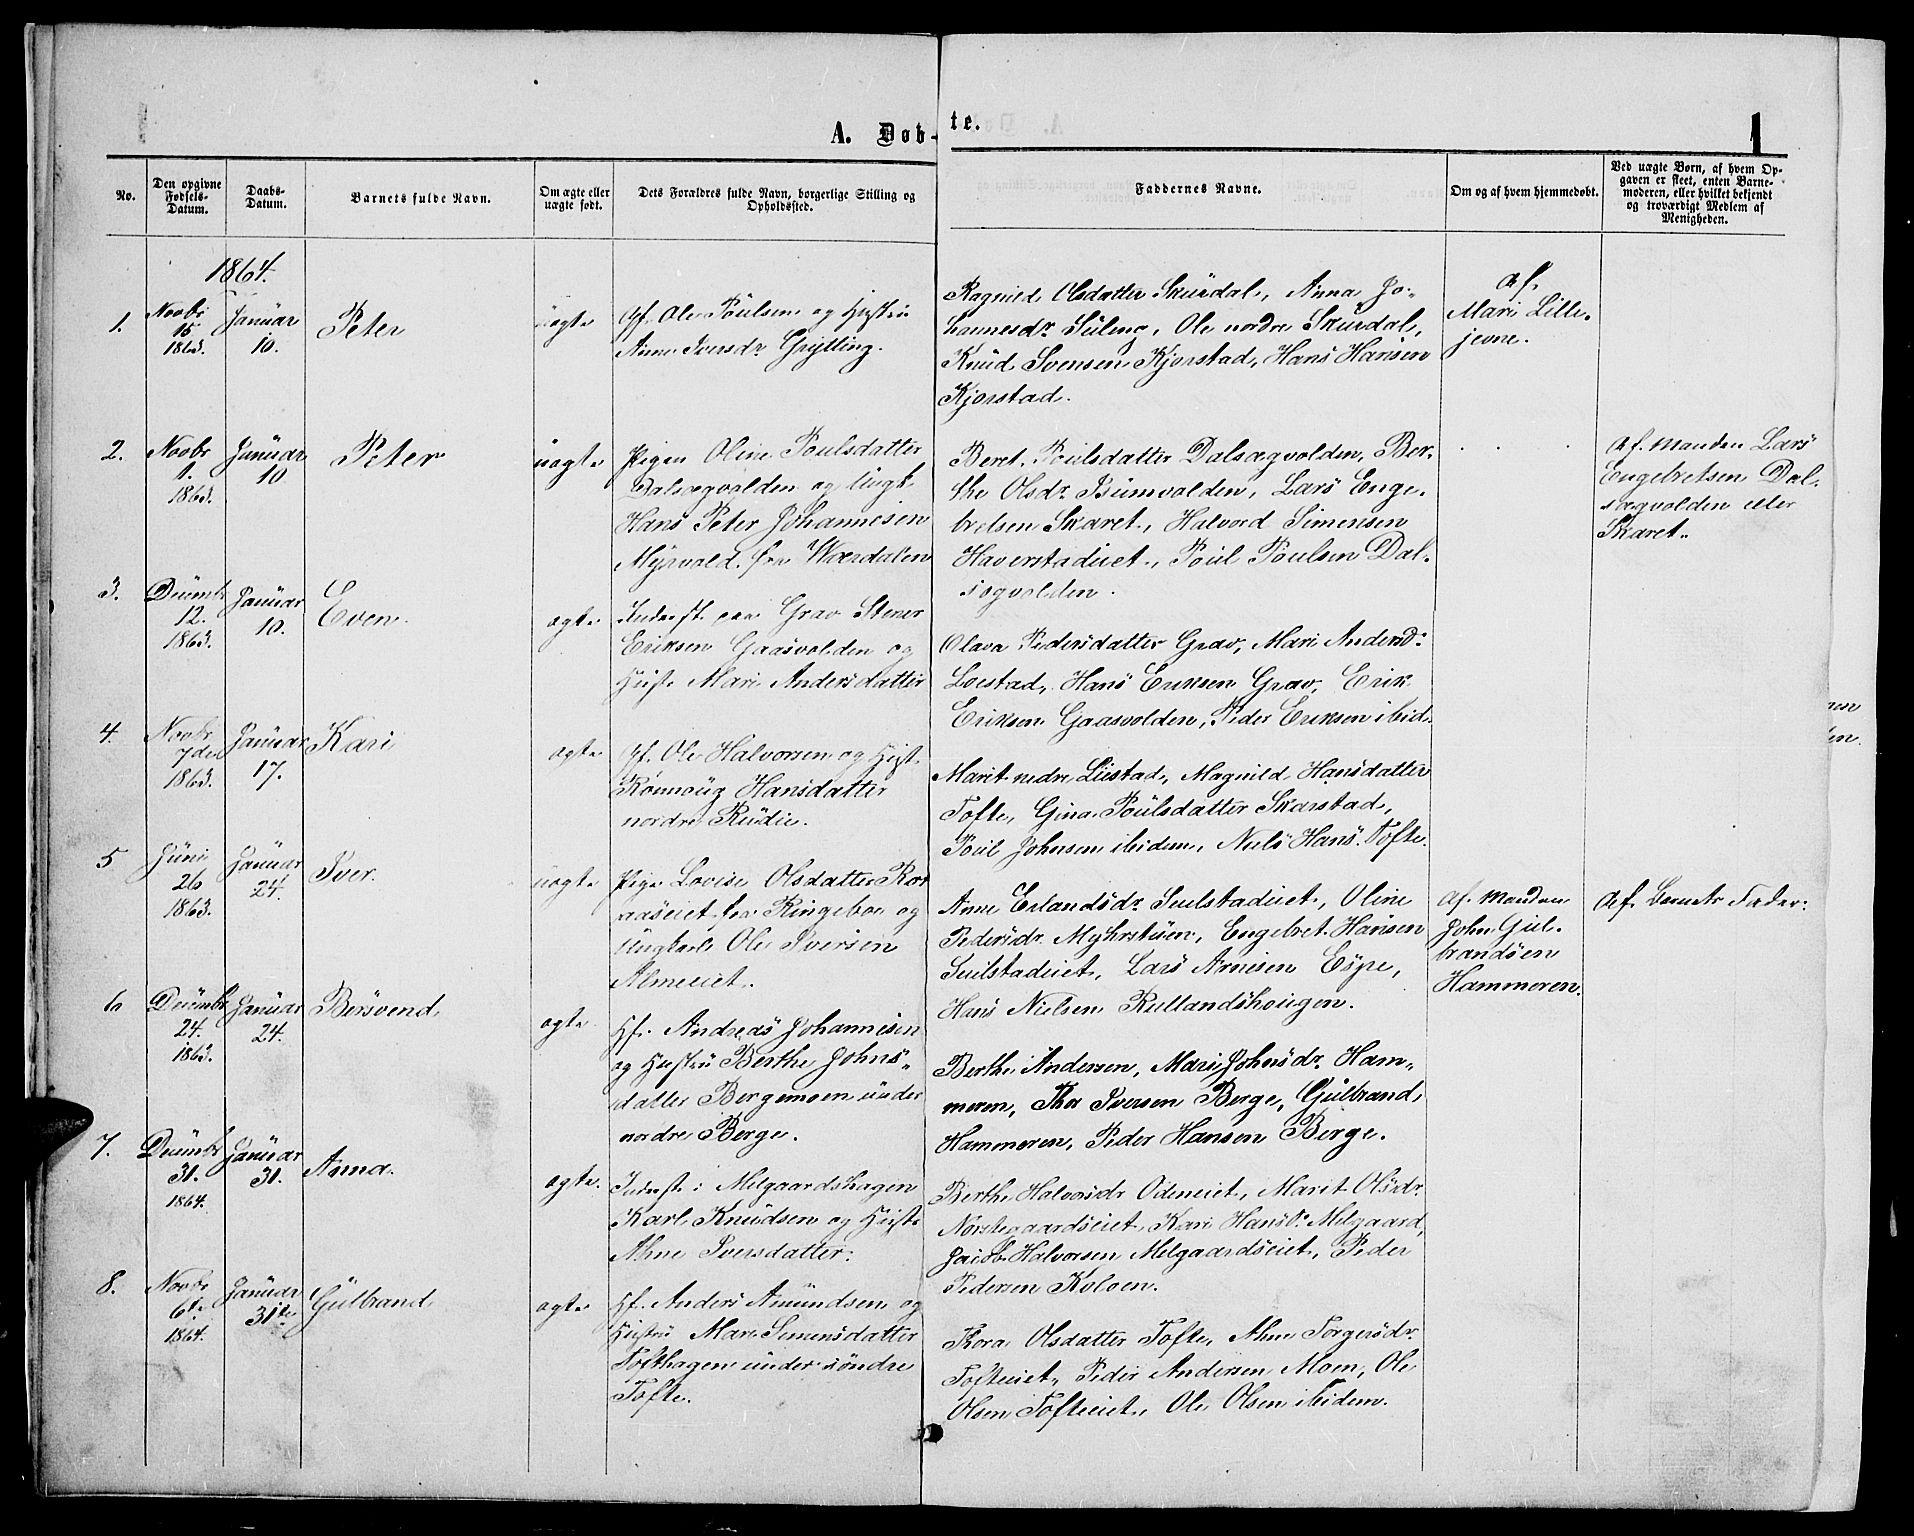 SAH, Sør-Fron prestekontor, H/Ha/Hab/L0002: Klokkerbok nr. 2, 1864-1883, s. 1